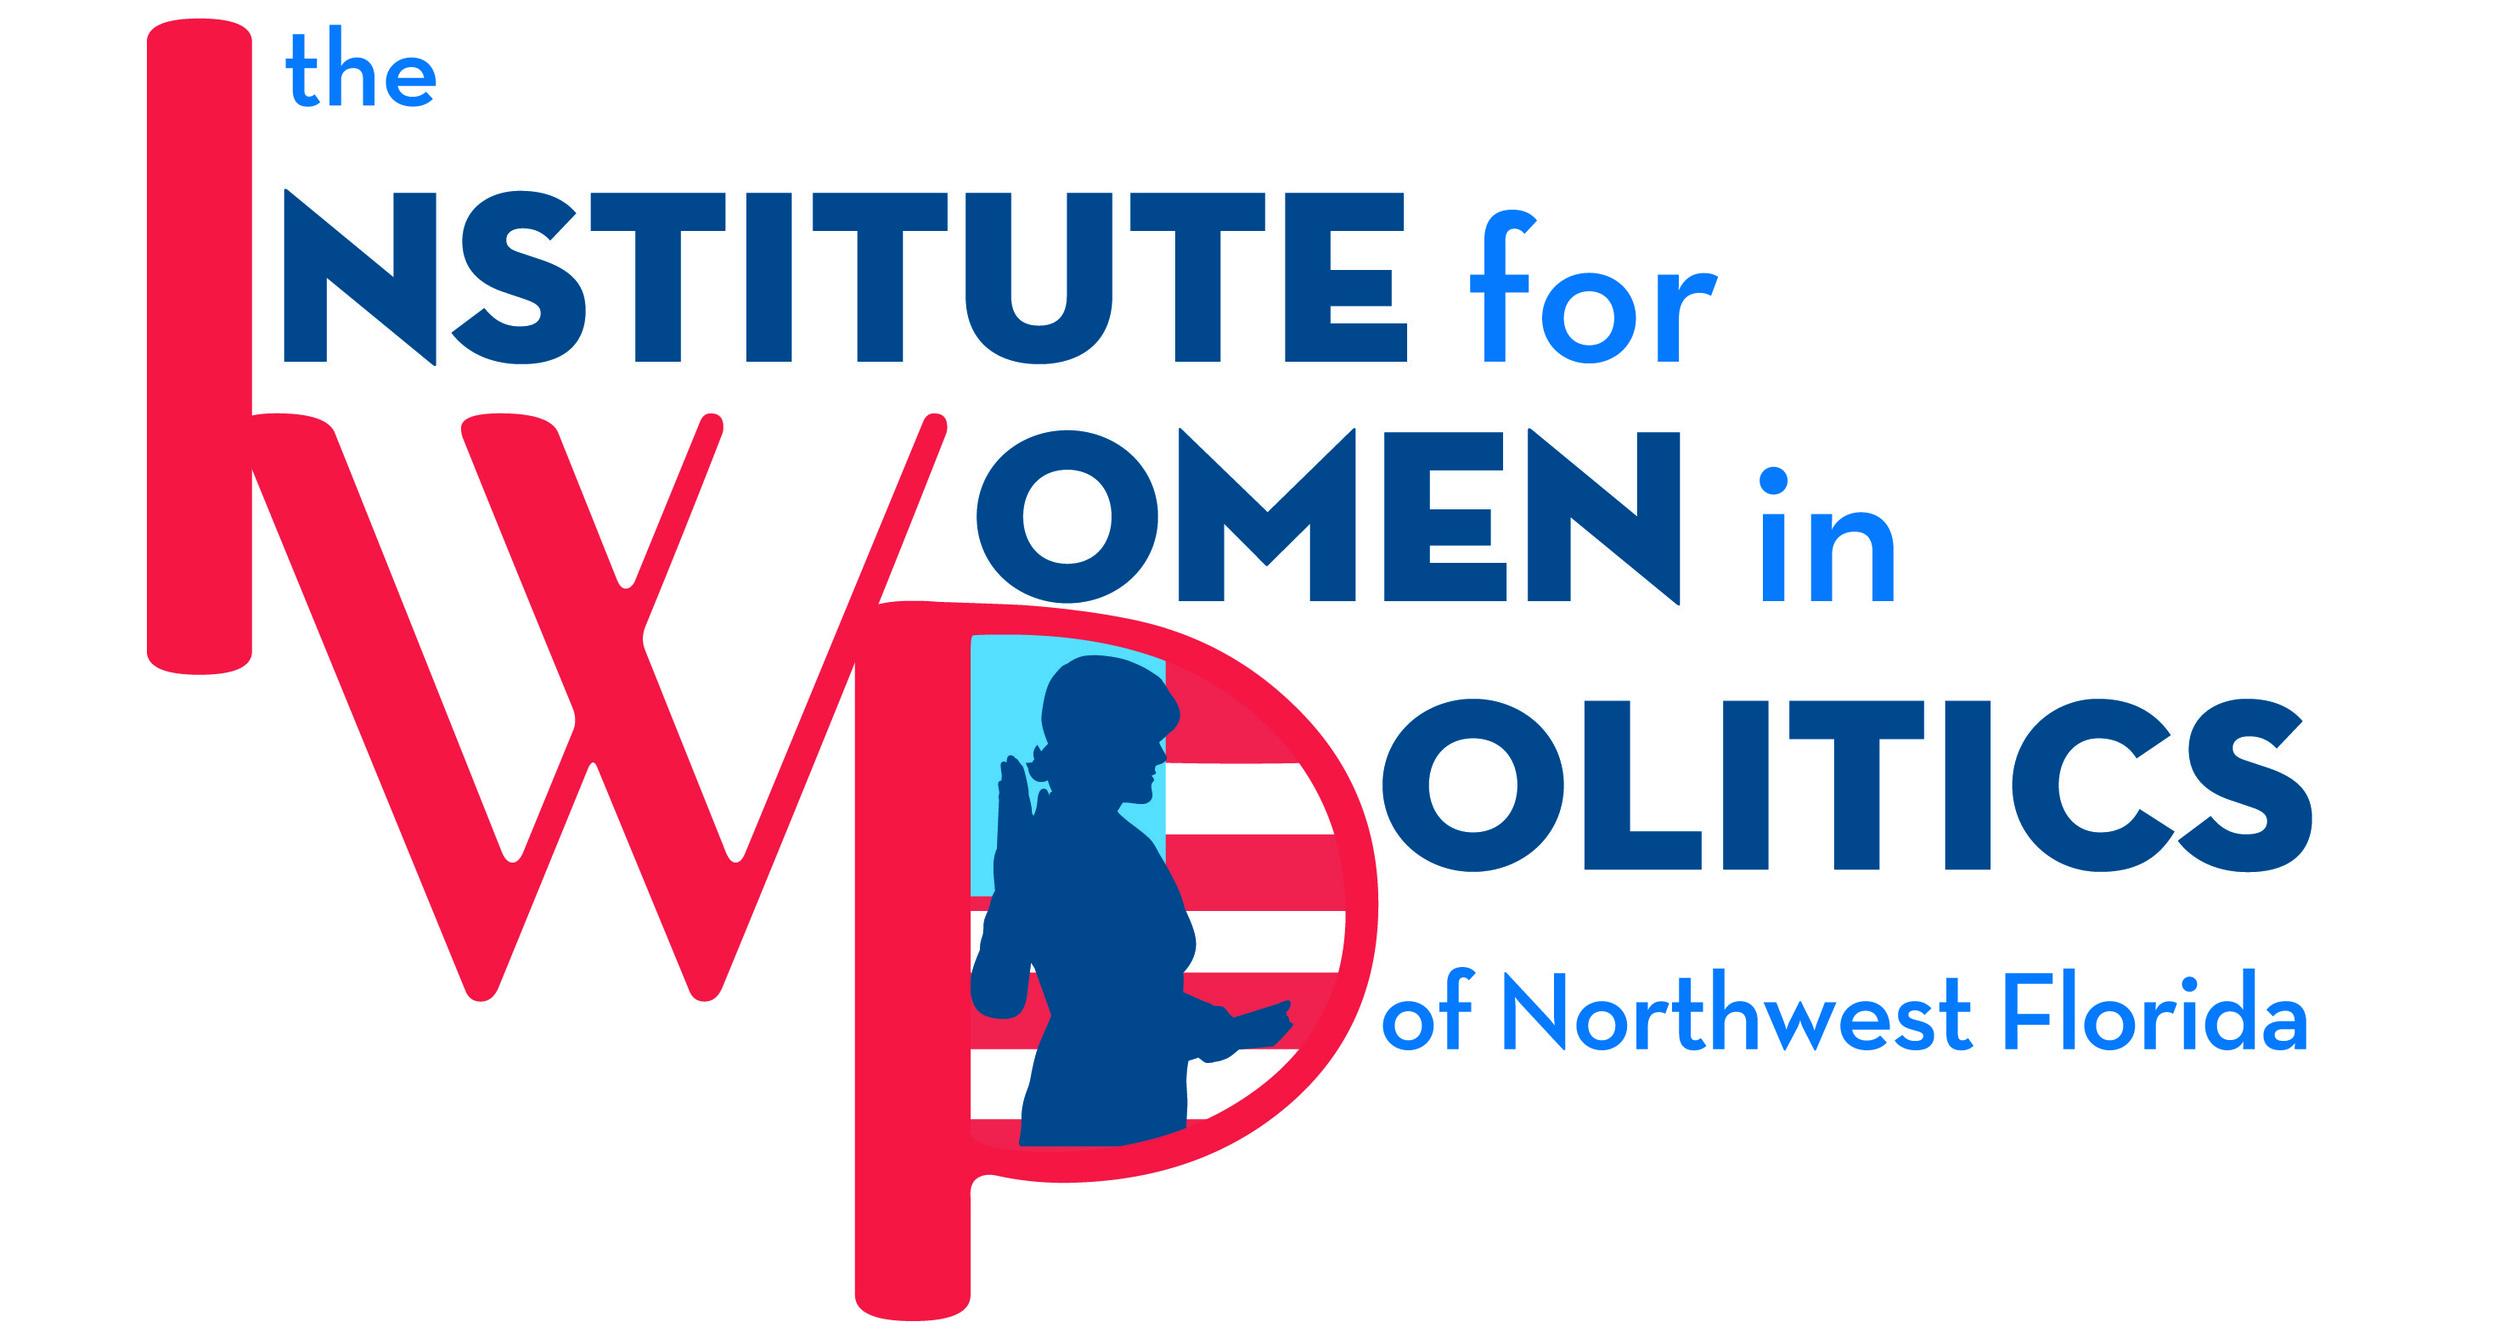 The Institute for Women in Politics